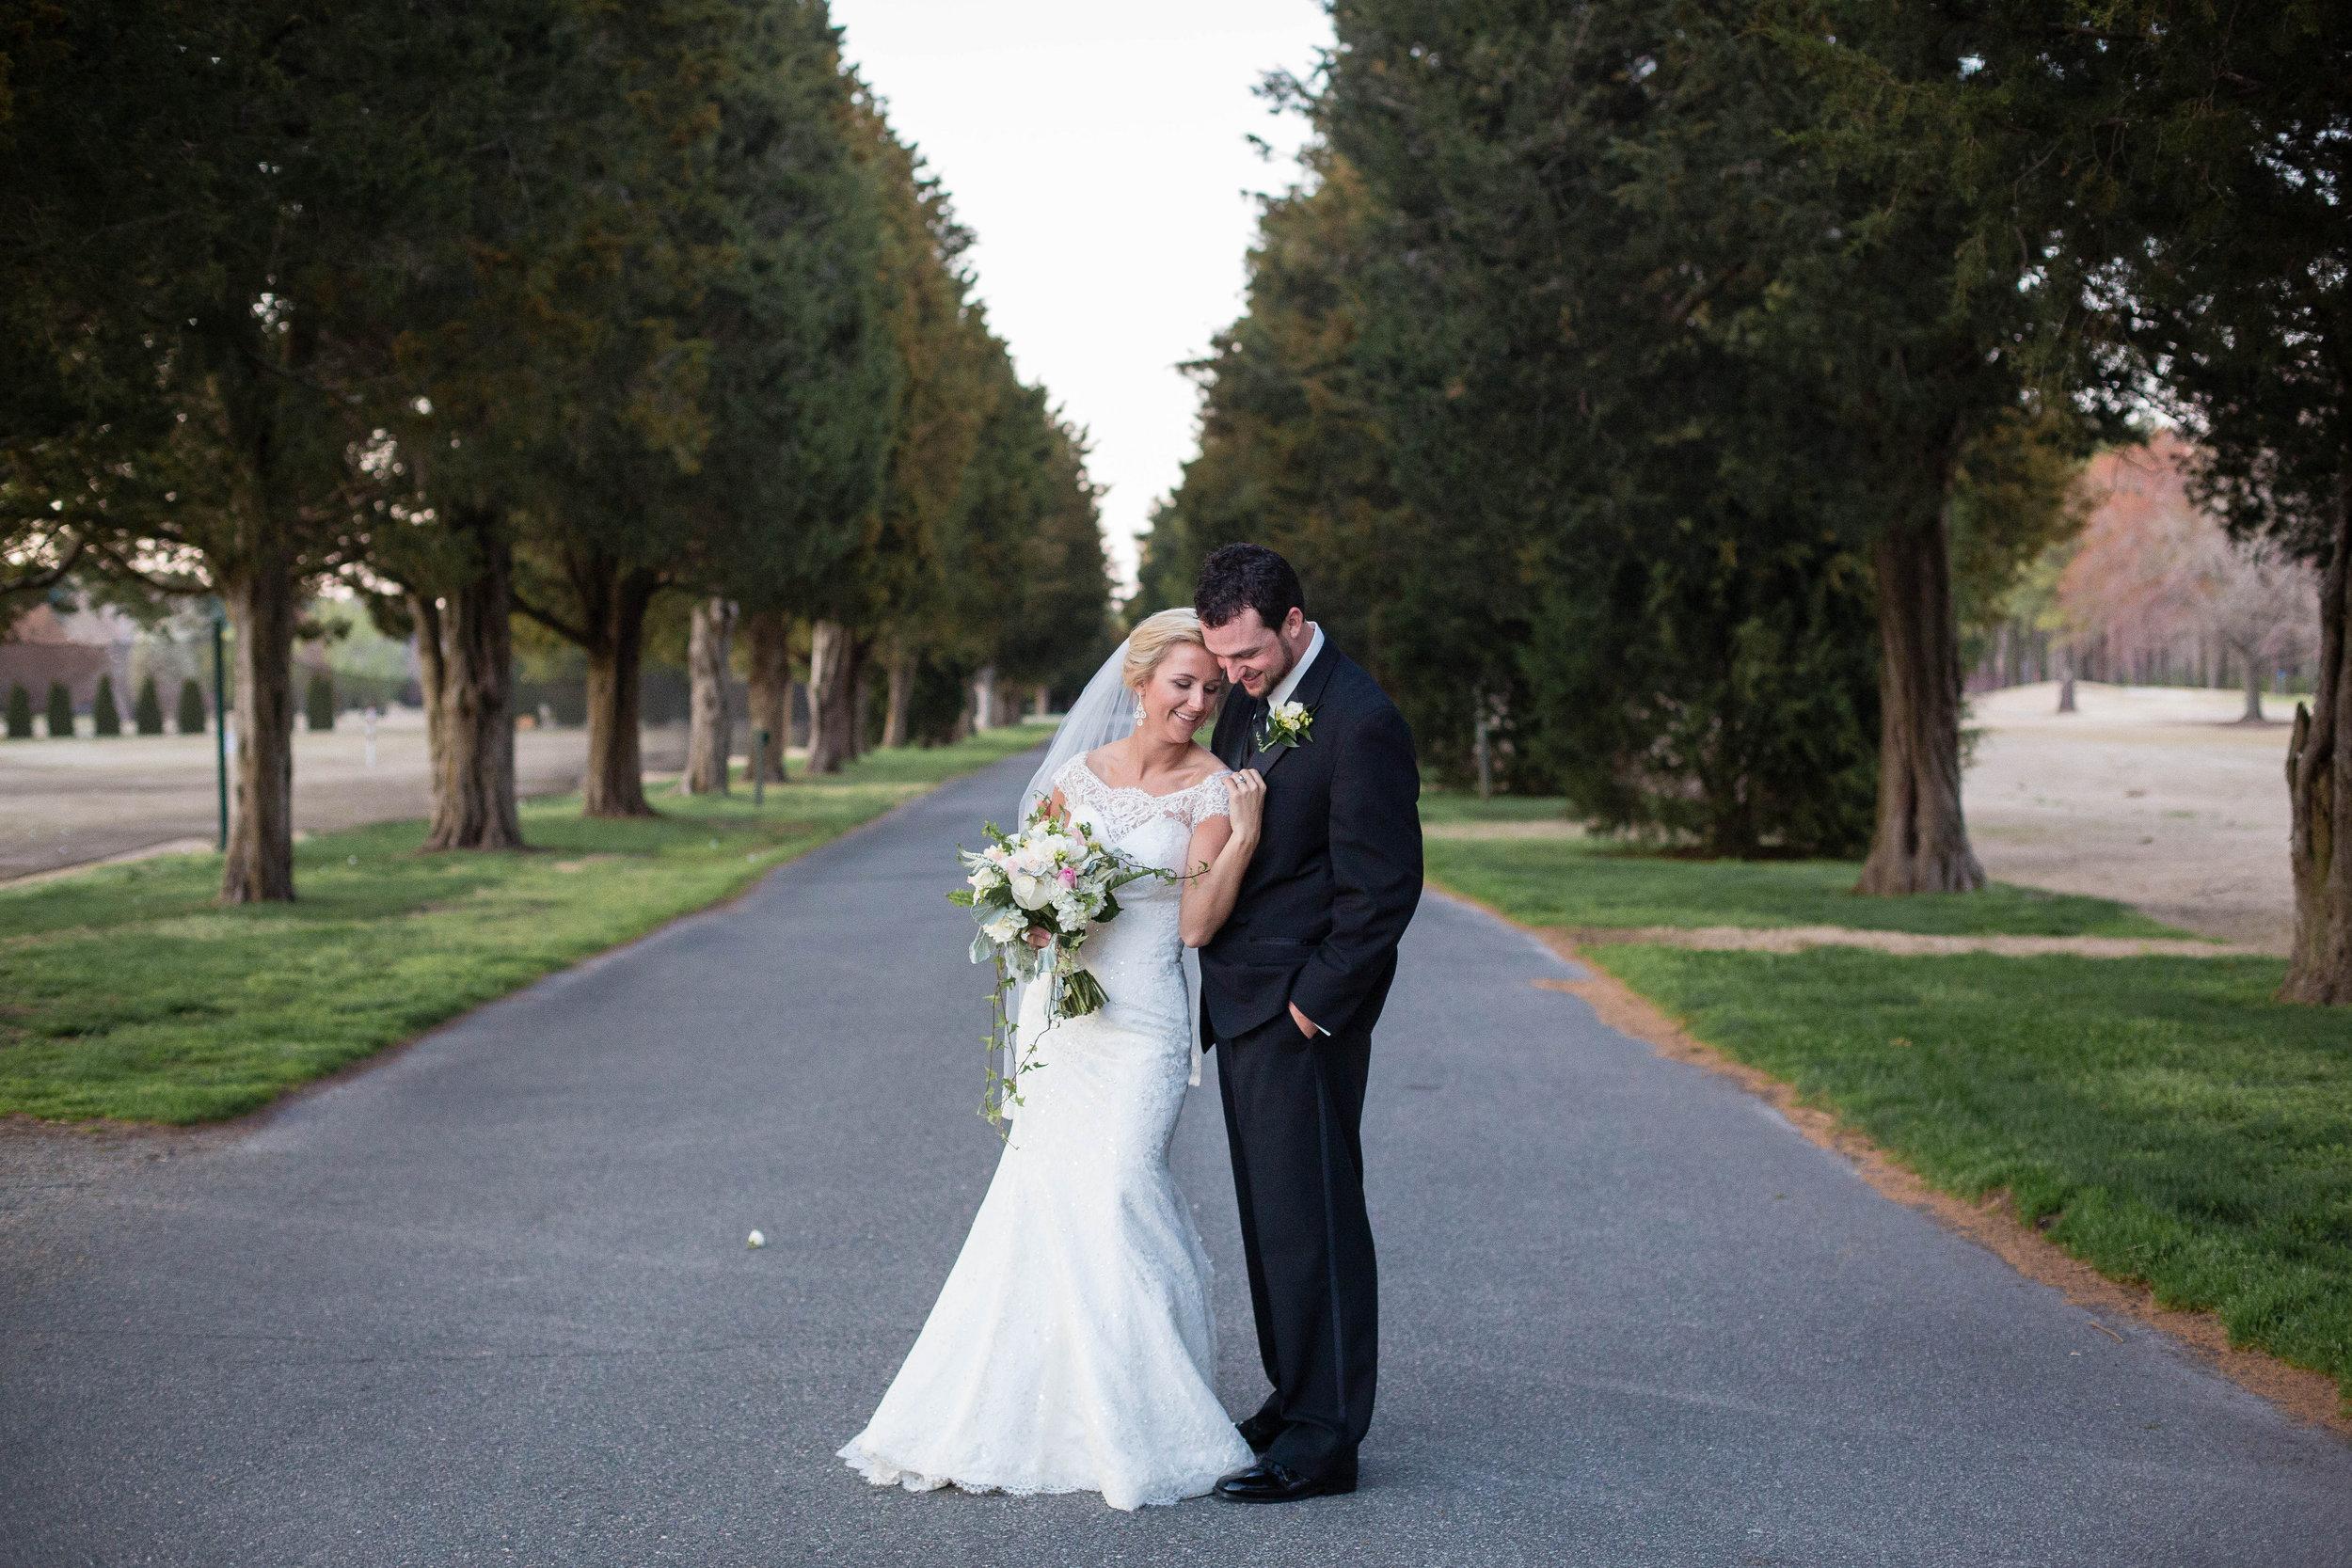 Kyle Mary Married-Photographer Favs-0043.jpg